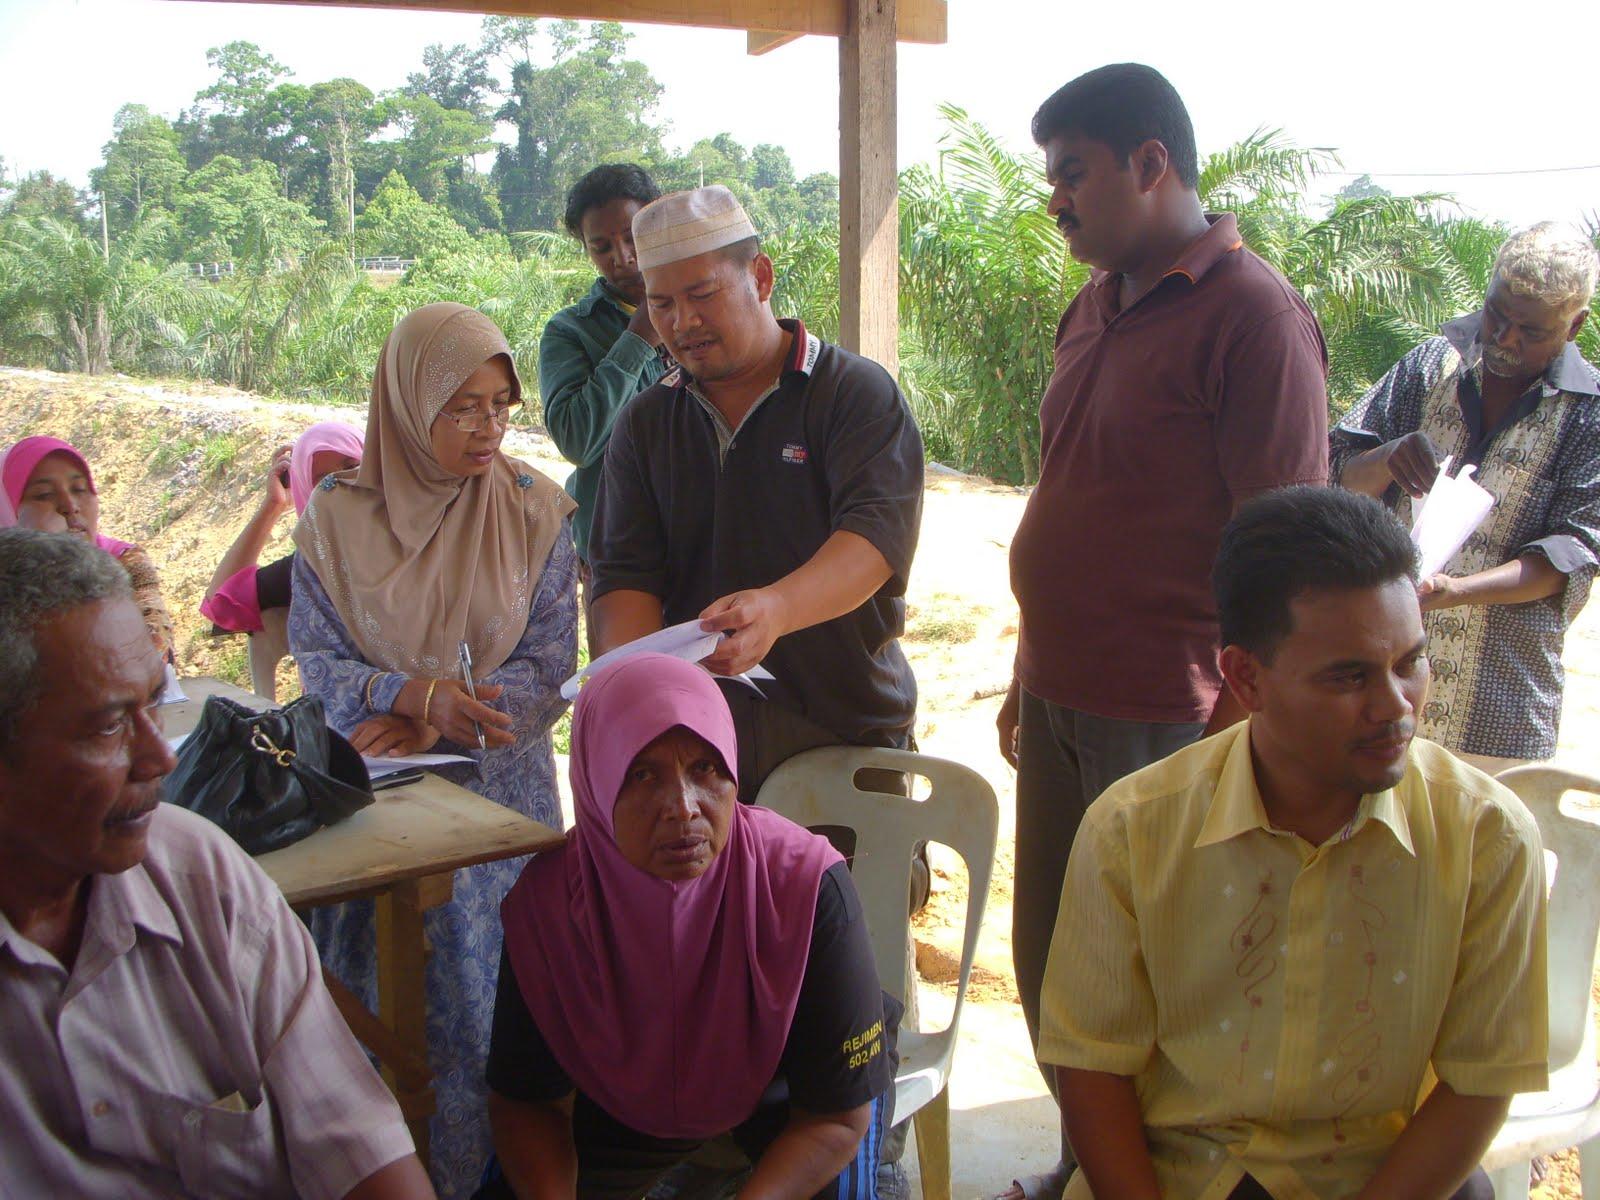 Sdr Rebin Birham Setiausaha Biro Masyarakat Felda dan Orang Asal kanan sekali bergambar dengan pengusaha ikan air tawar di Felda Gedangsa